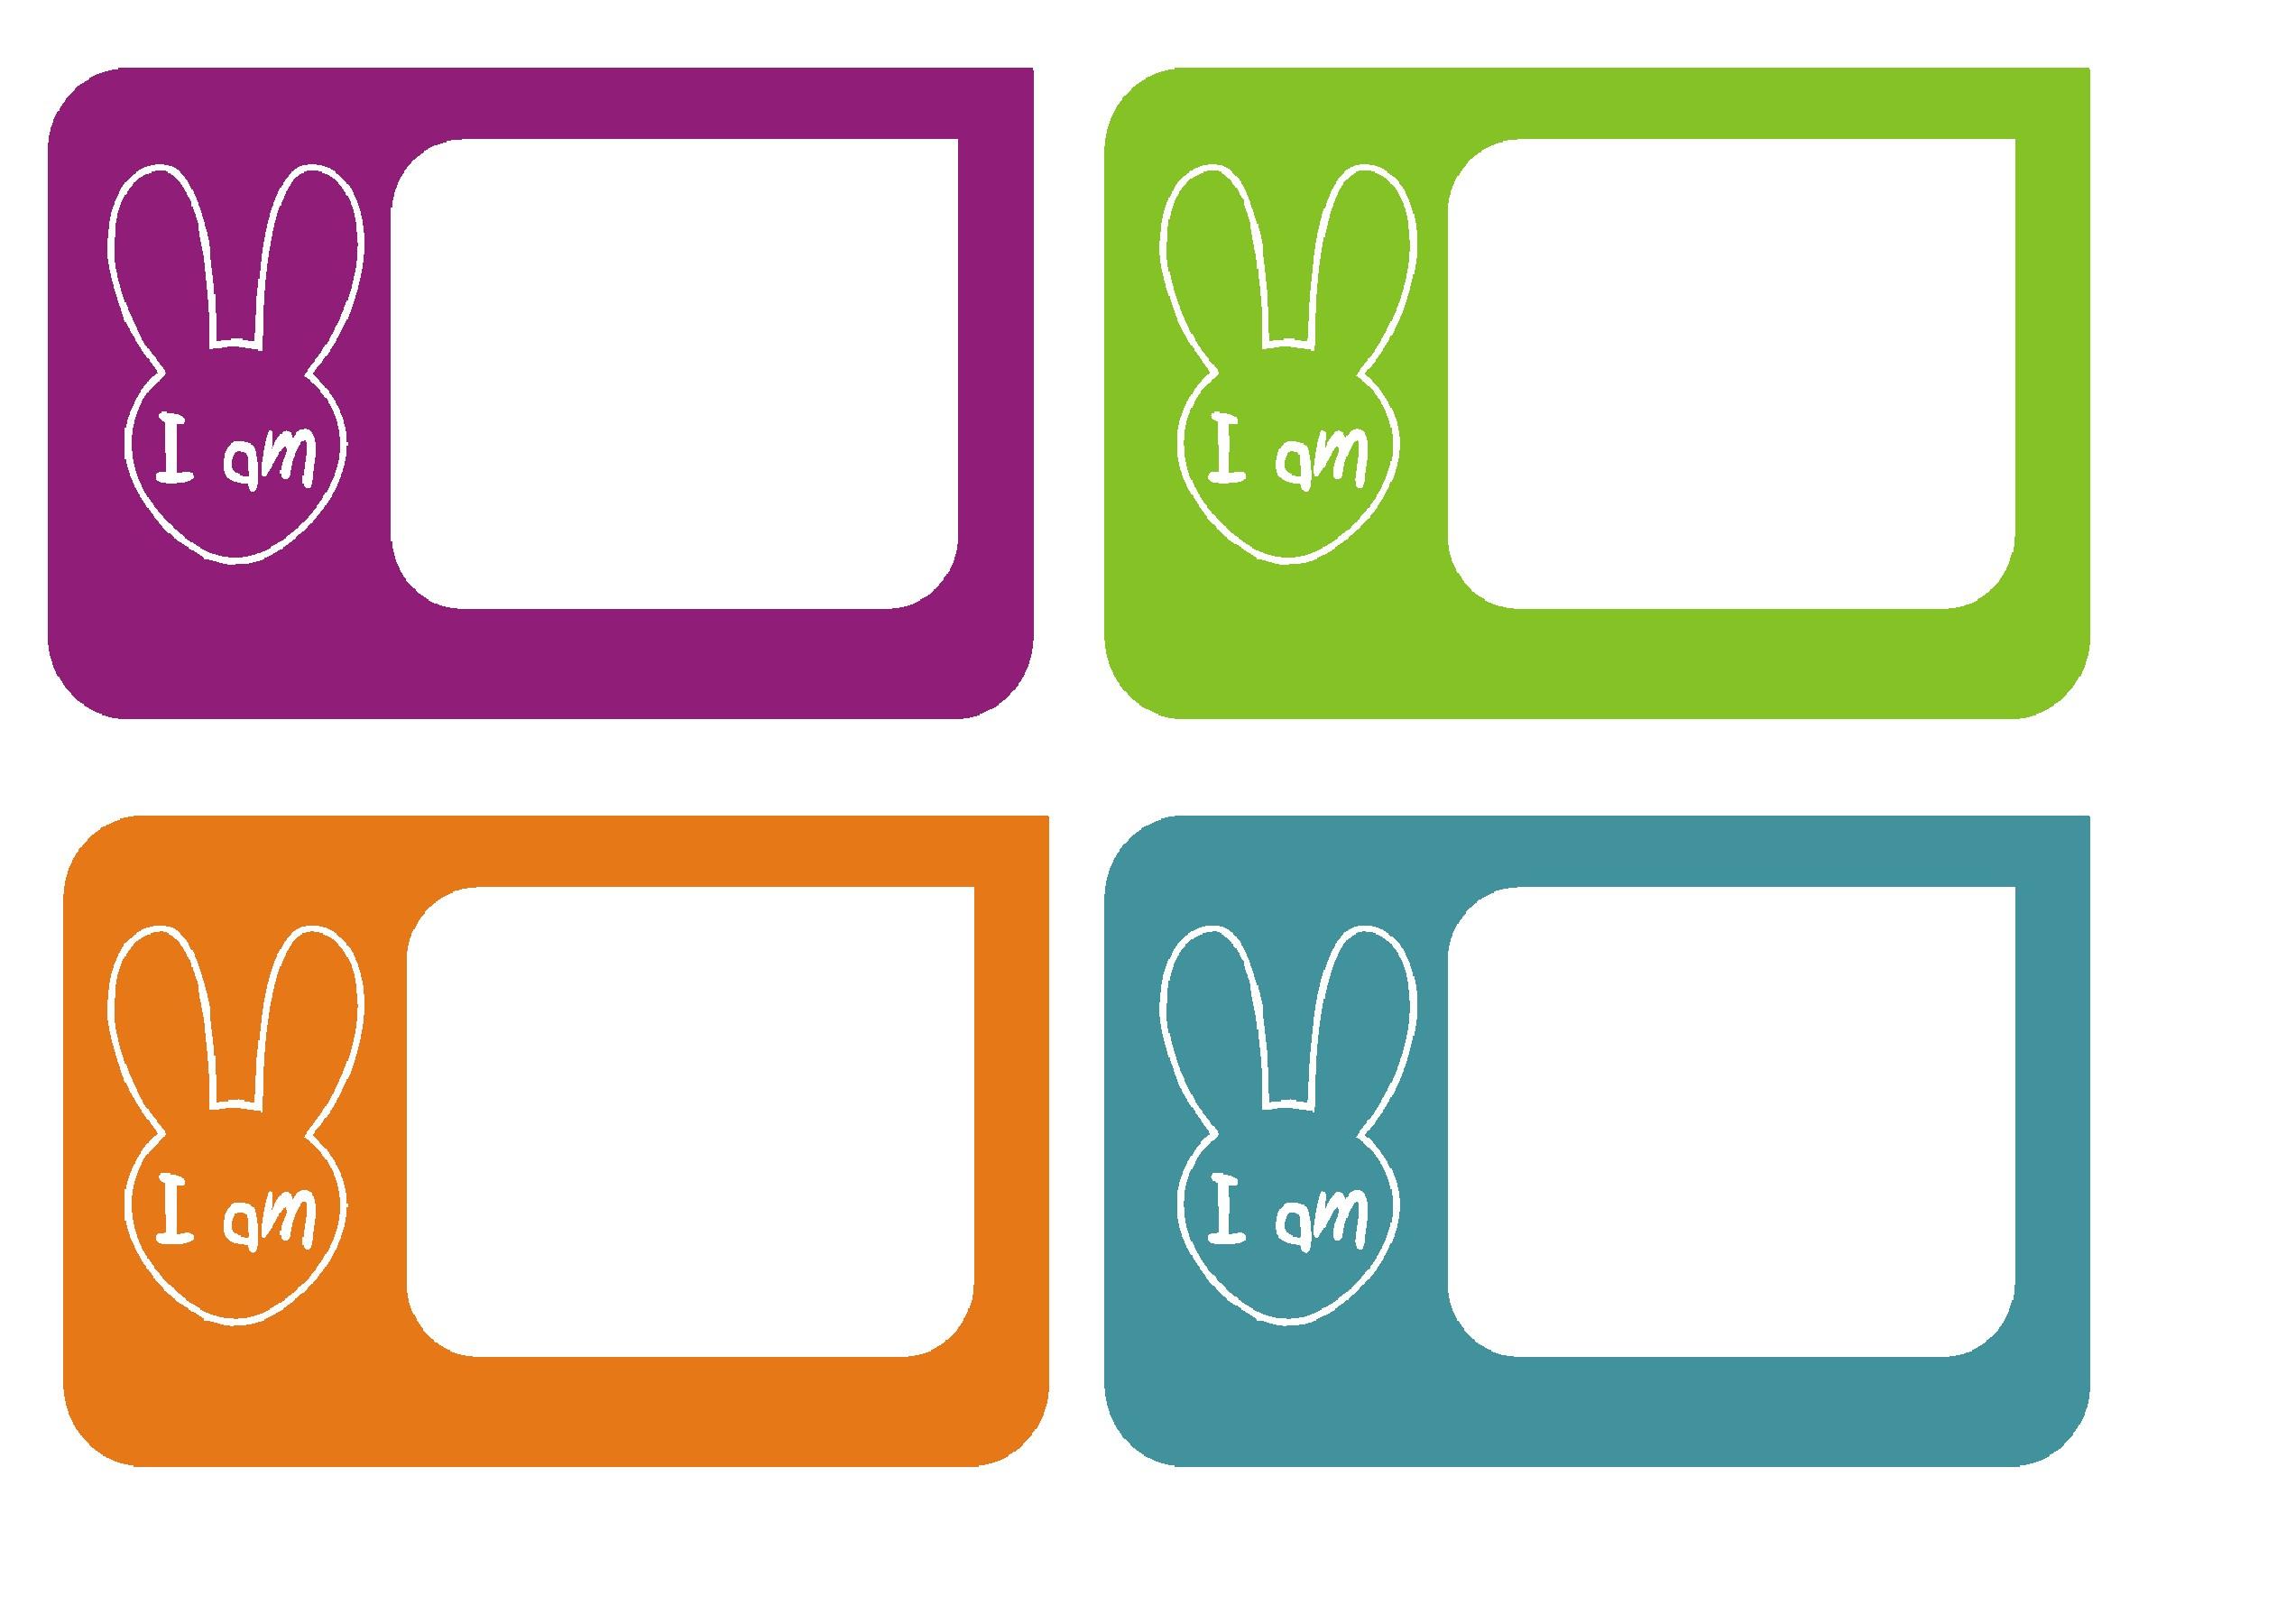 Astonishing Cute Name Tags My Purplehoneyjar | Apofore Cute Name - Free Printable Name Labels For Kids